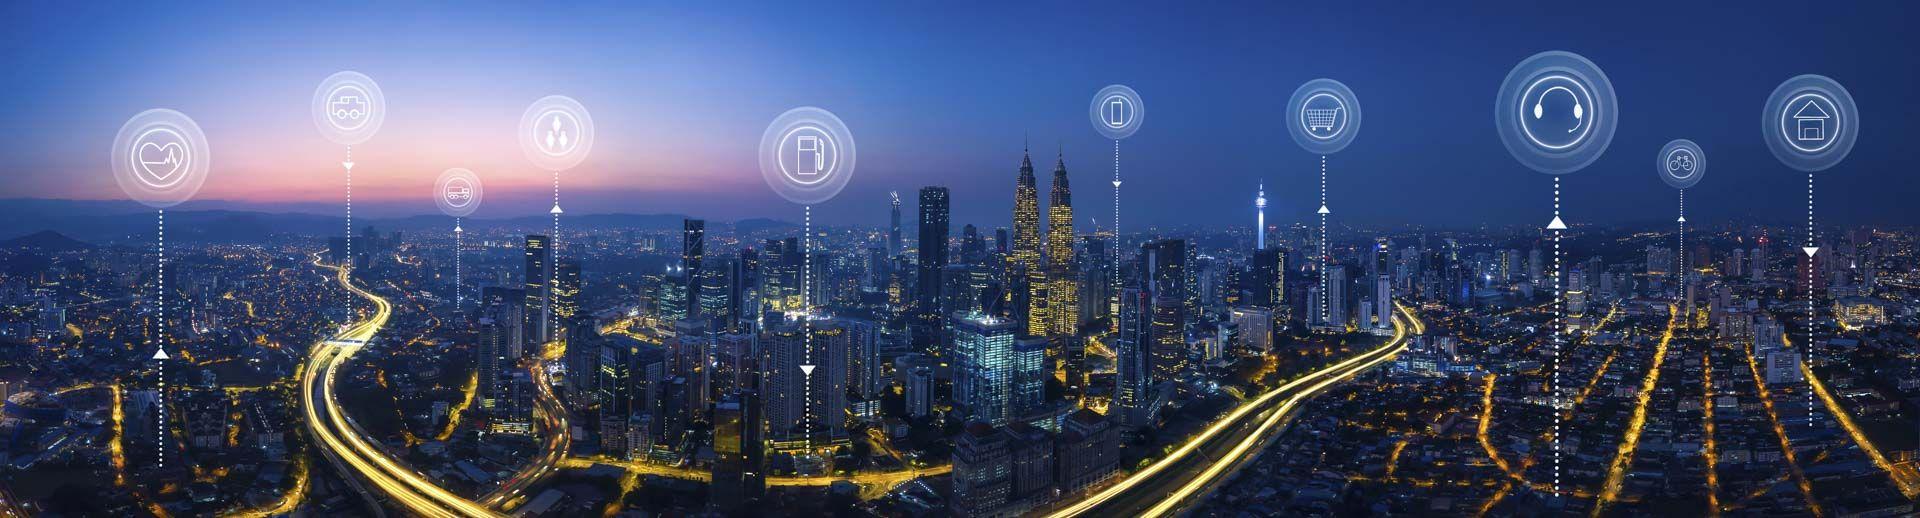 network-night-city